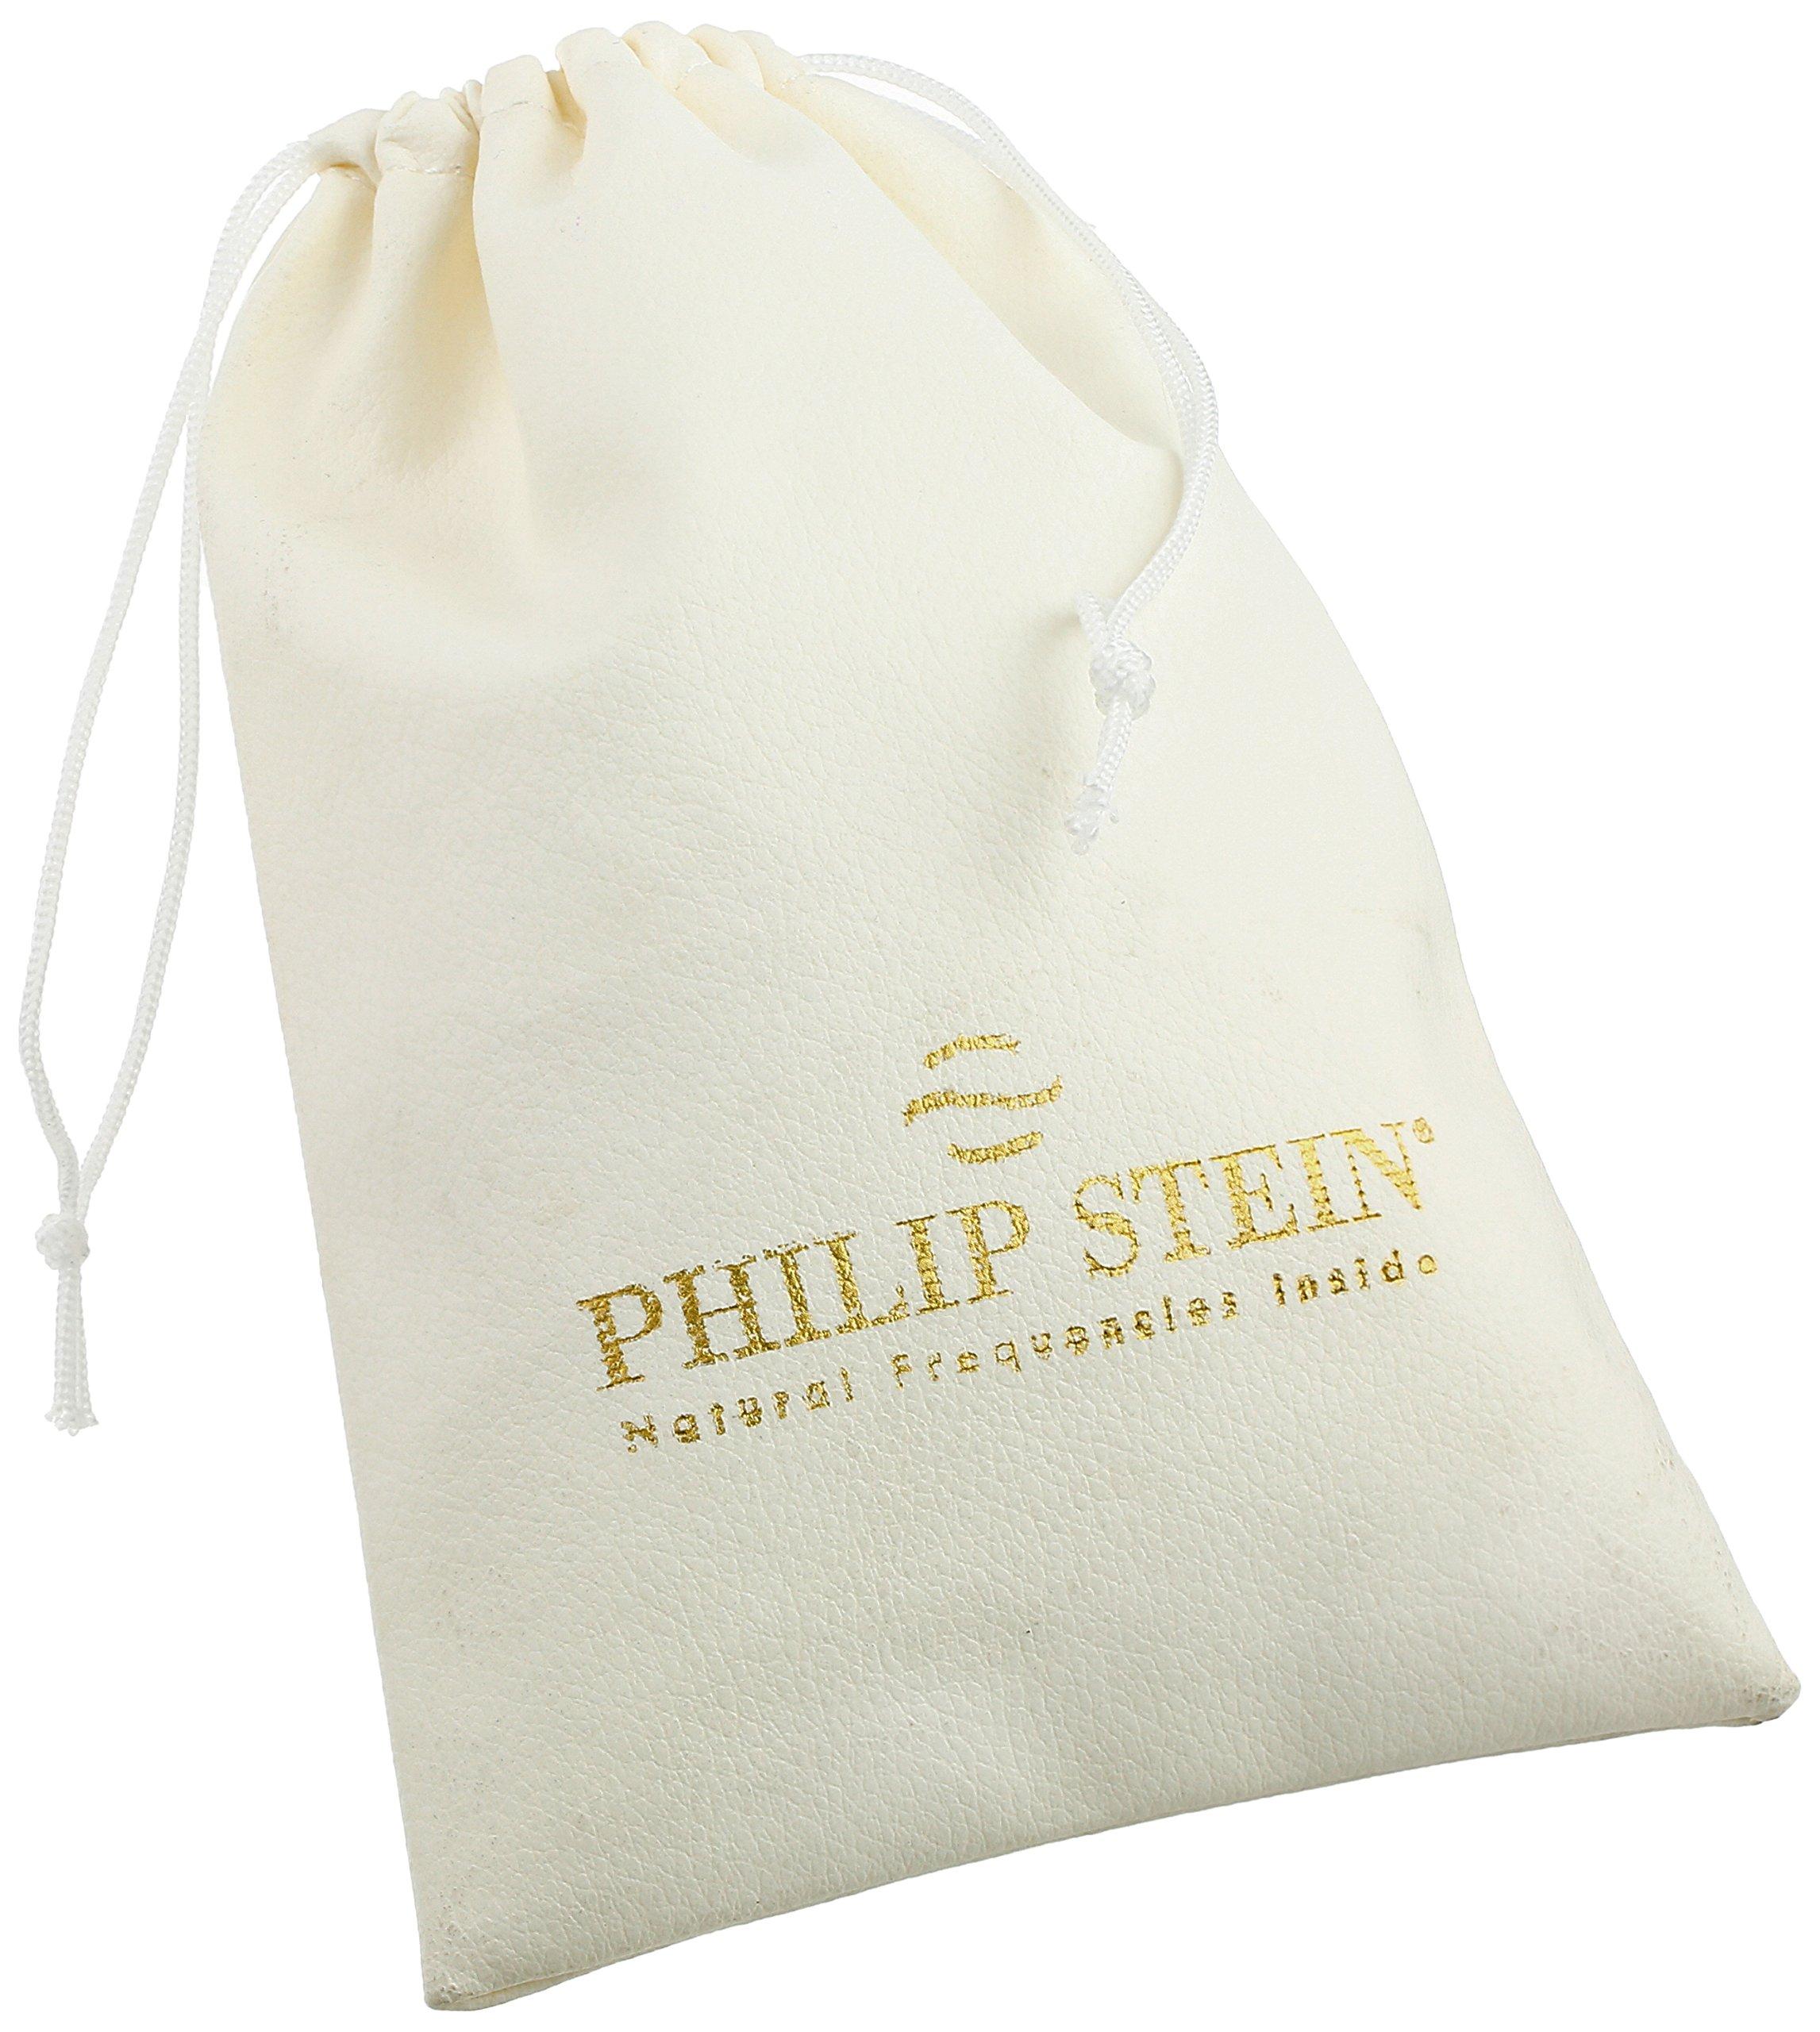 Philip Stein 2-SS 20mm Stainless Steel Silver-Tone Watch Bracelet by Philip Stein (Image #4)